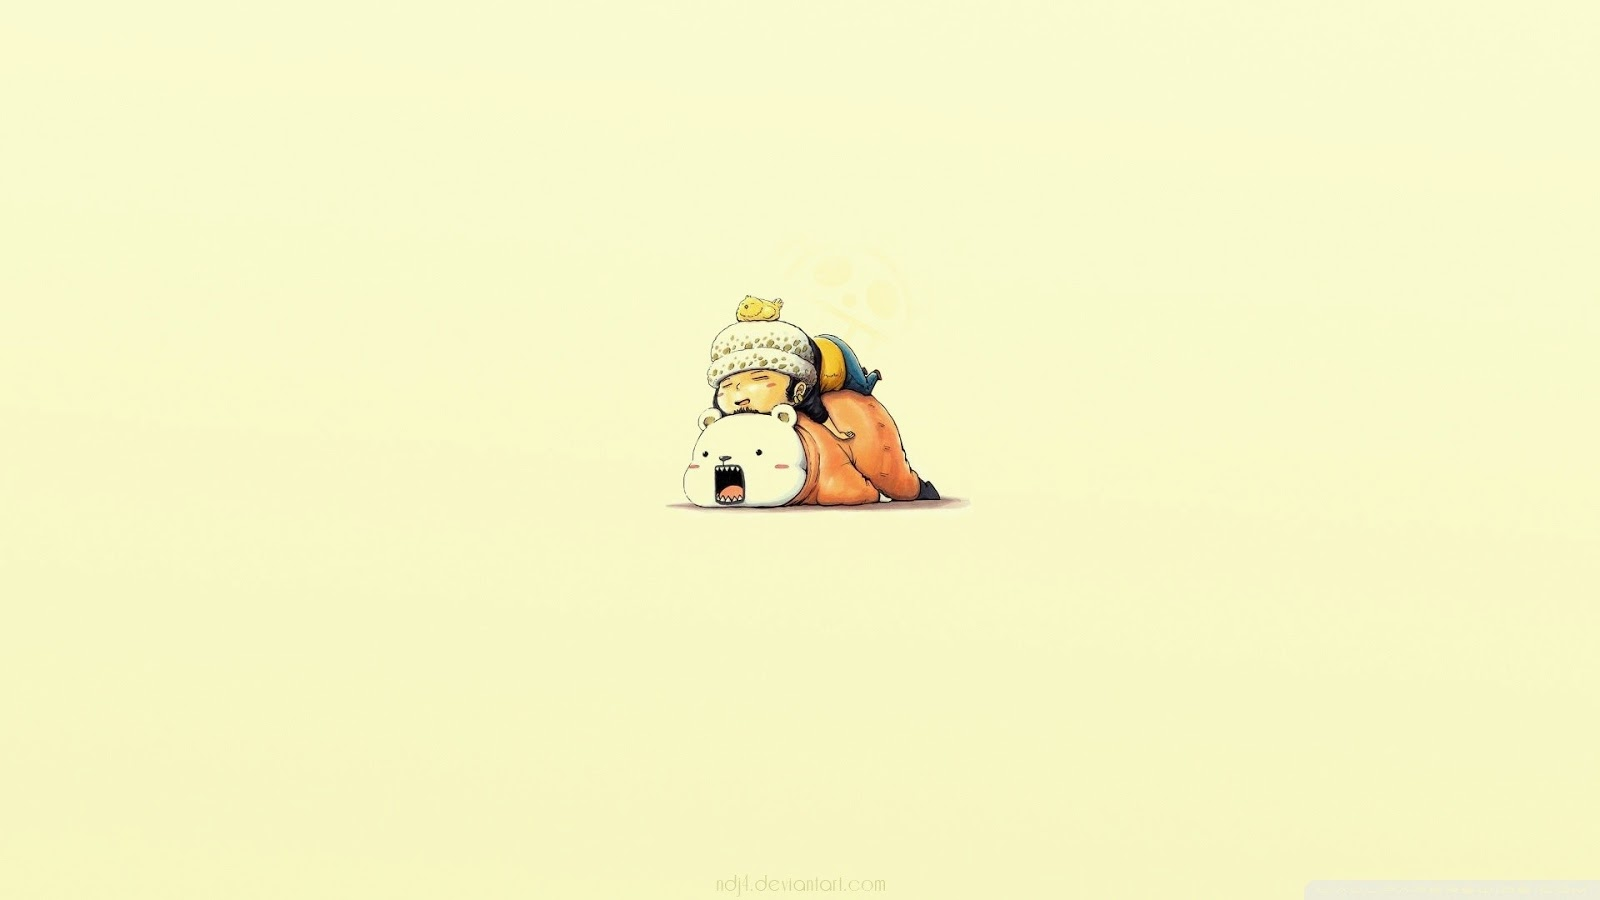 Cute Chibi Trafalgar Law Bepo Sleeping 0411 HD Wallpaper 1600x900